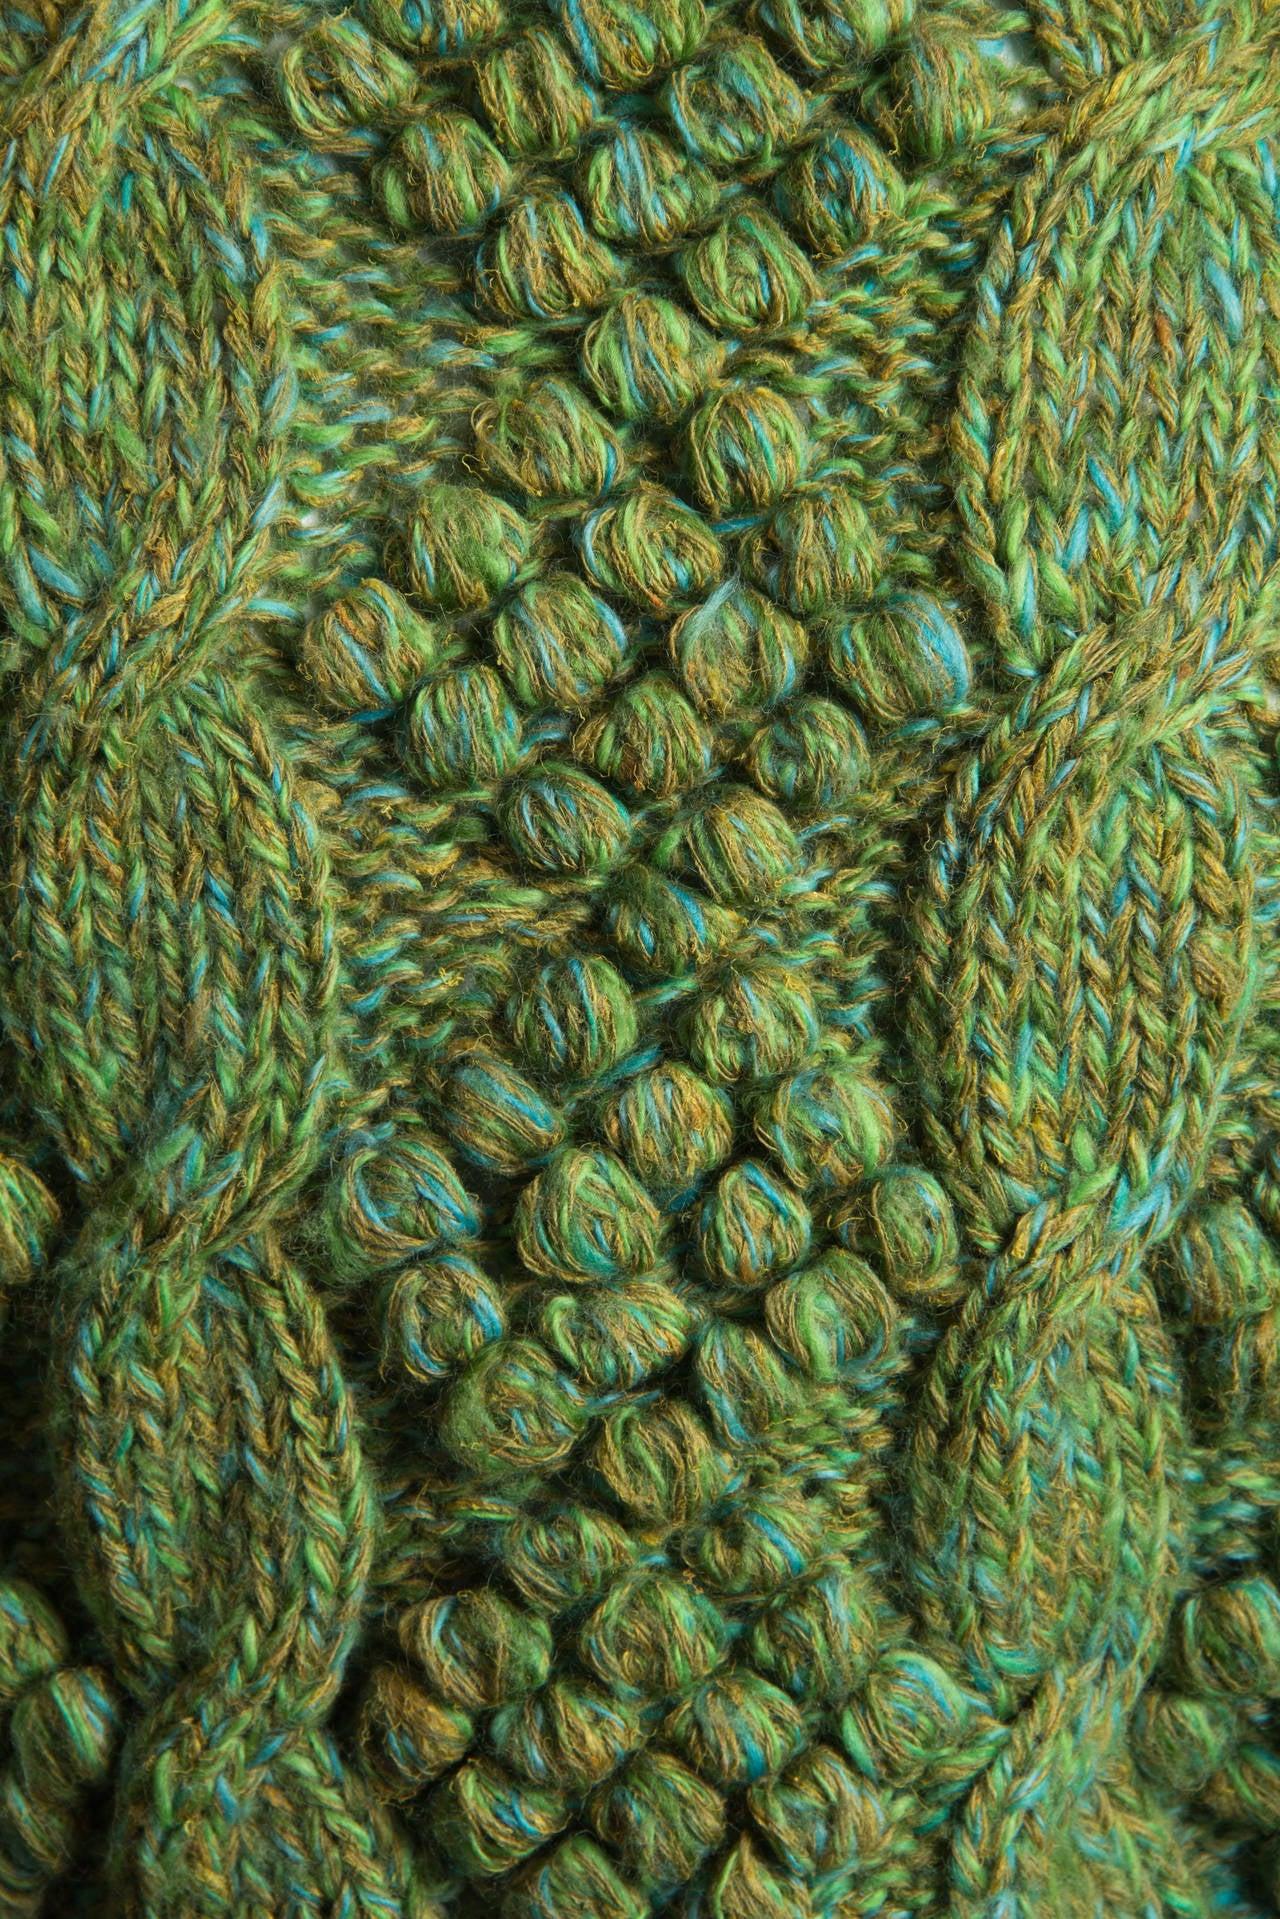 Women's Early Kansai Yammamoto Sweater For Sale